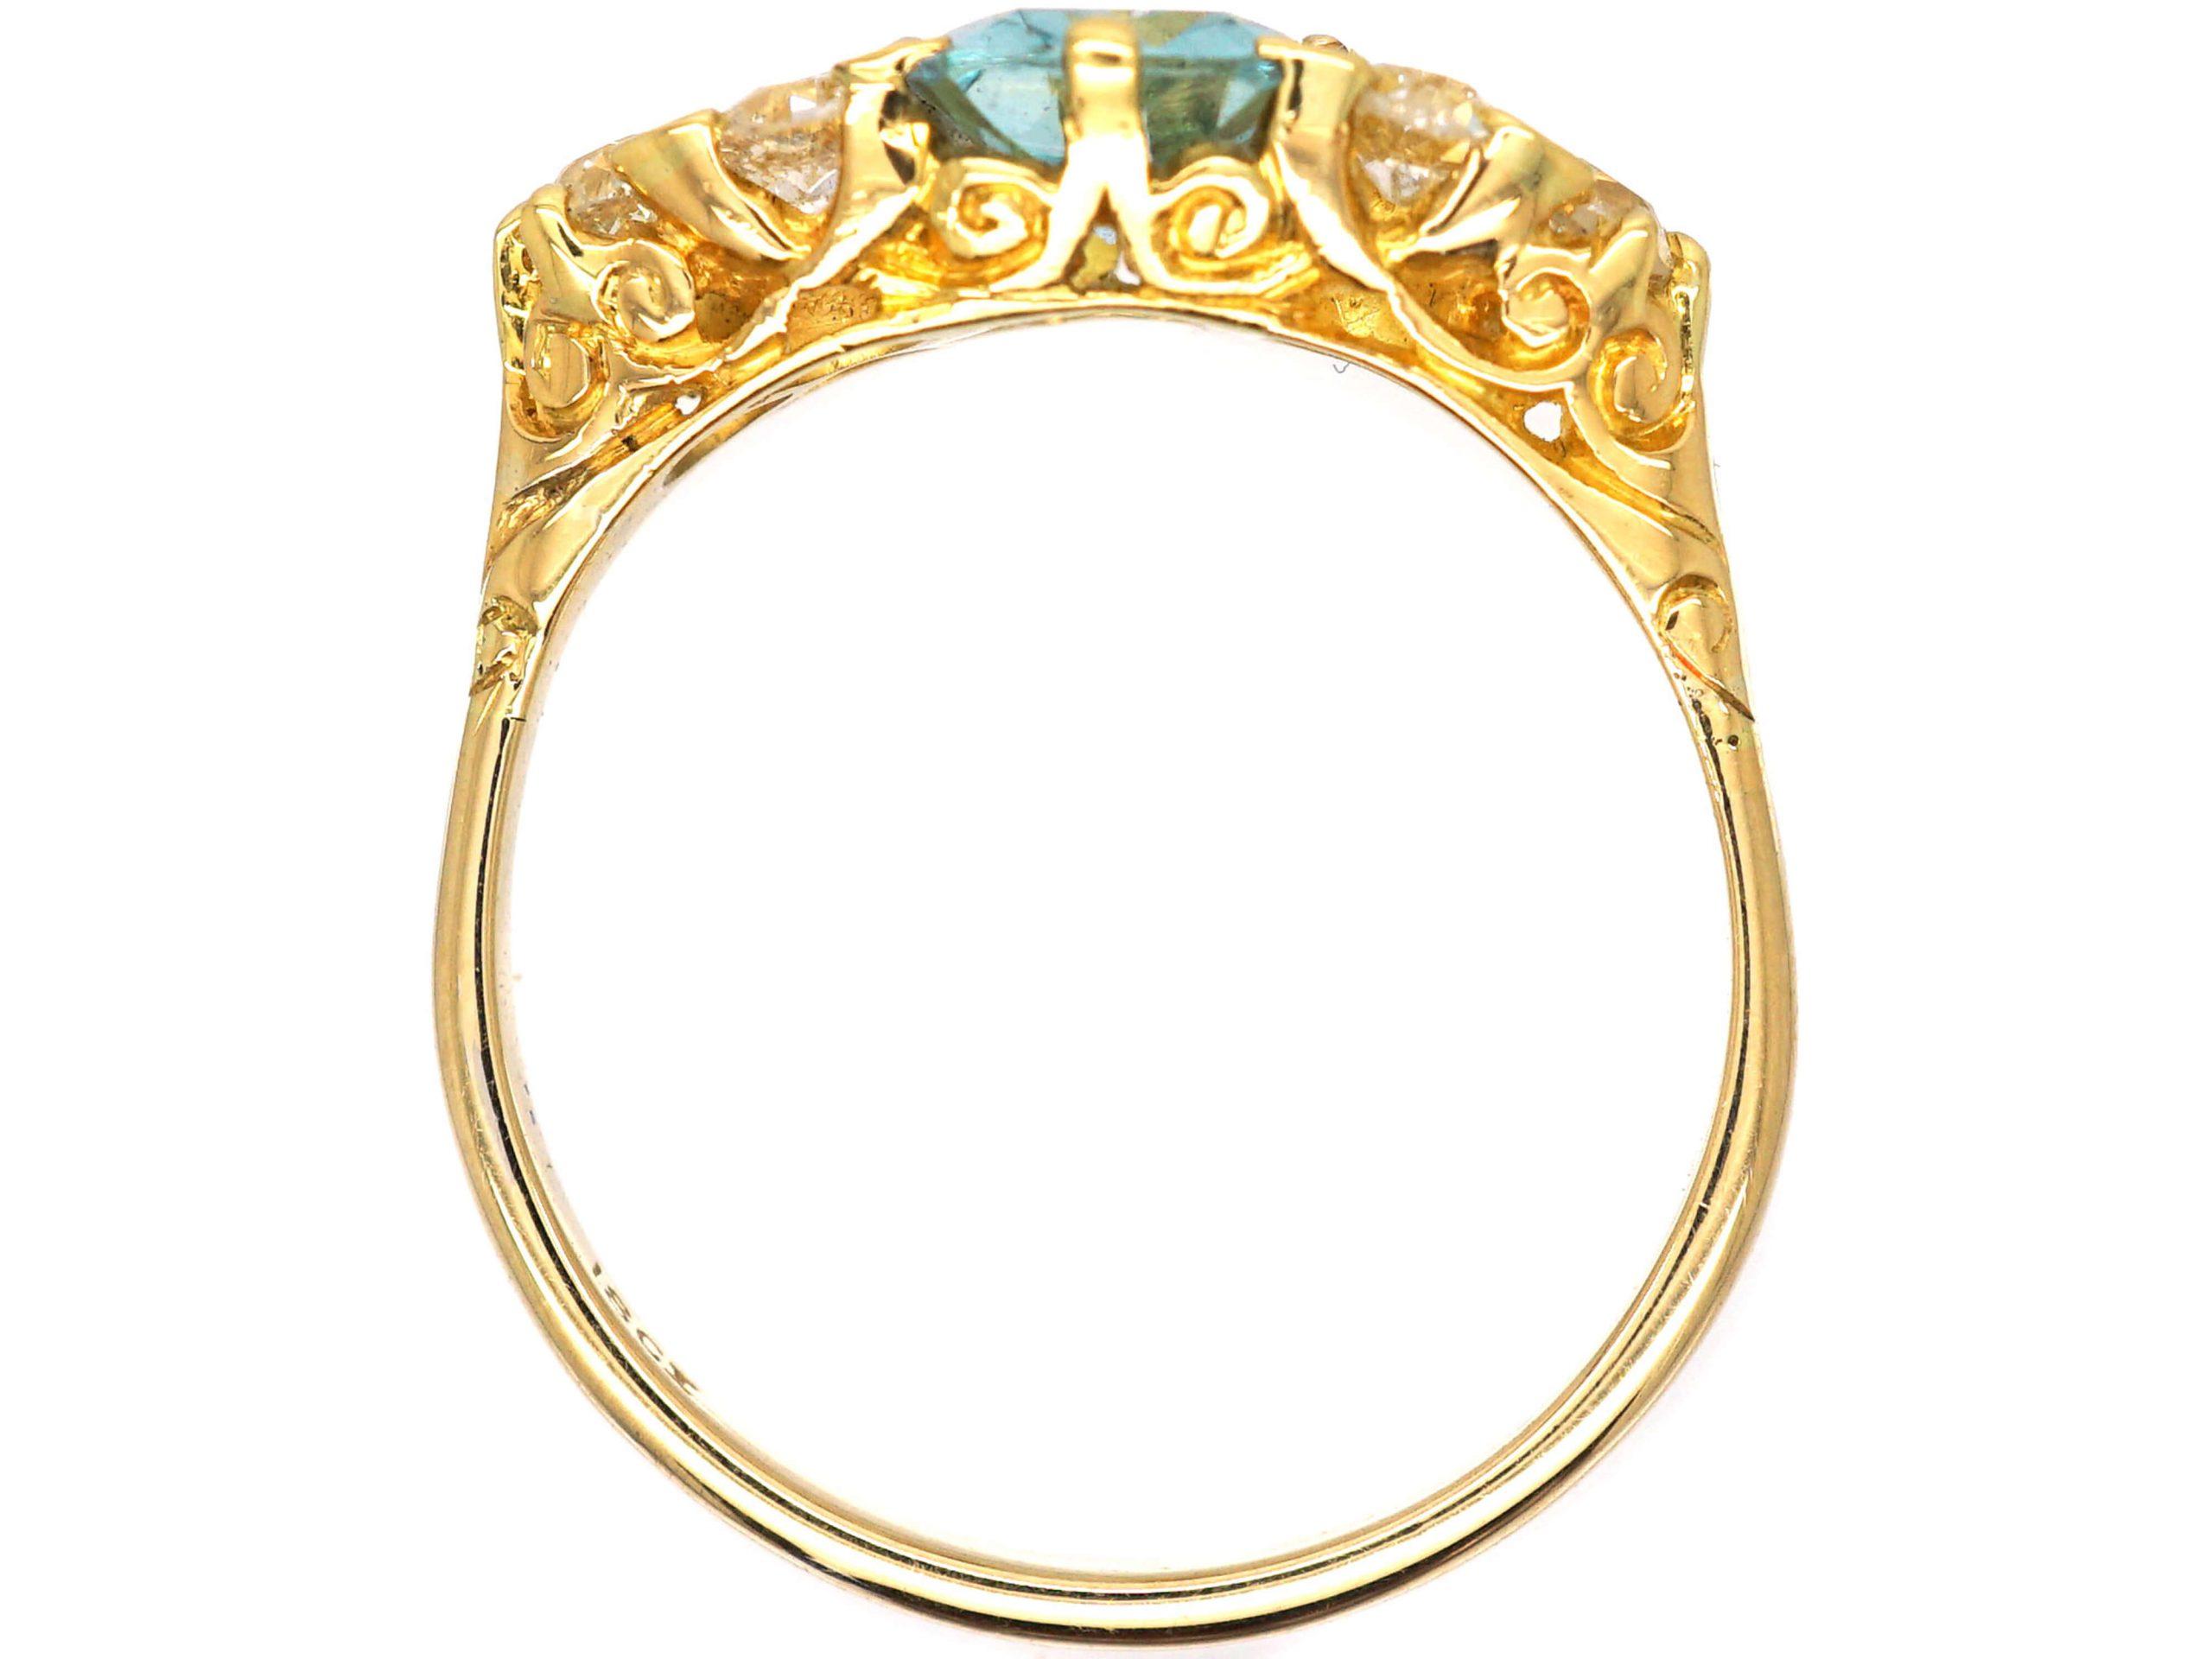 Edwardian 18ct Gold, Aquamarine & Old Mine Cut Diamond Ring